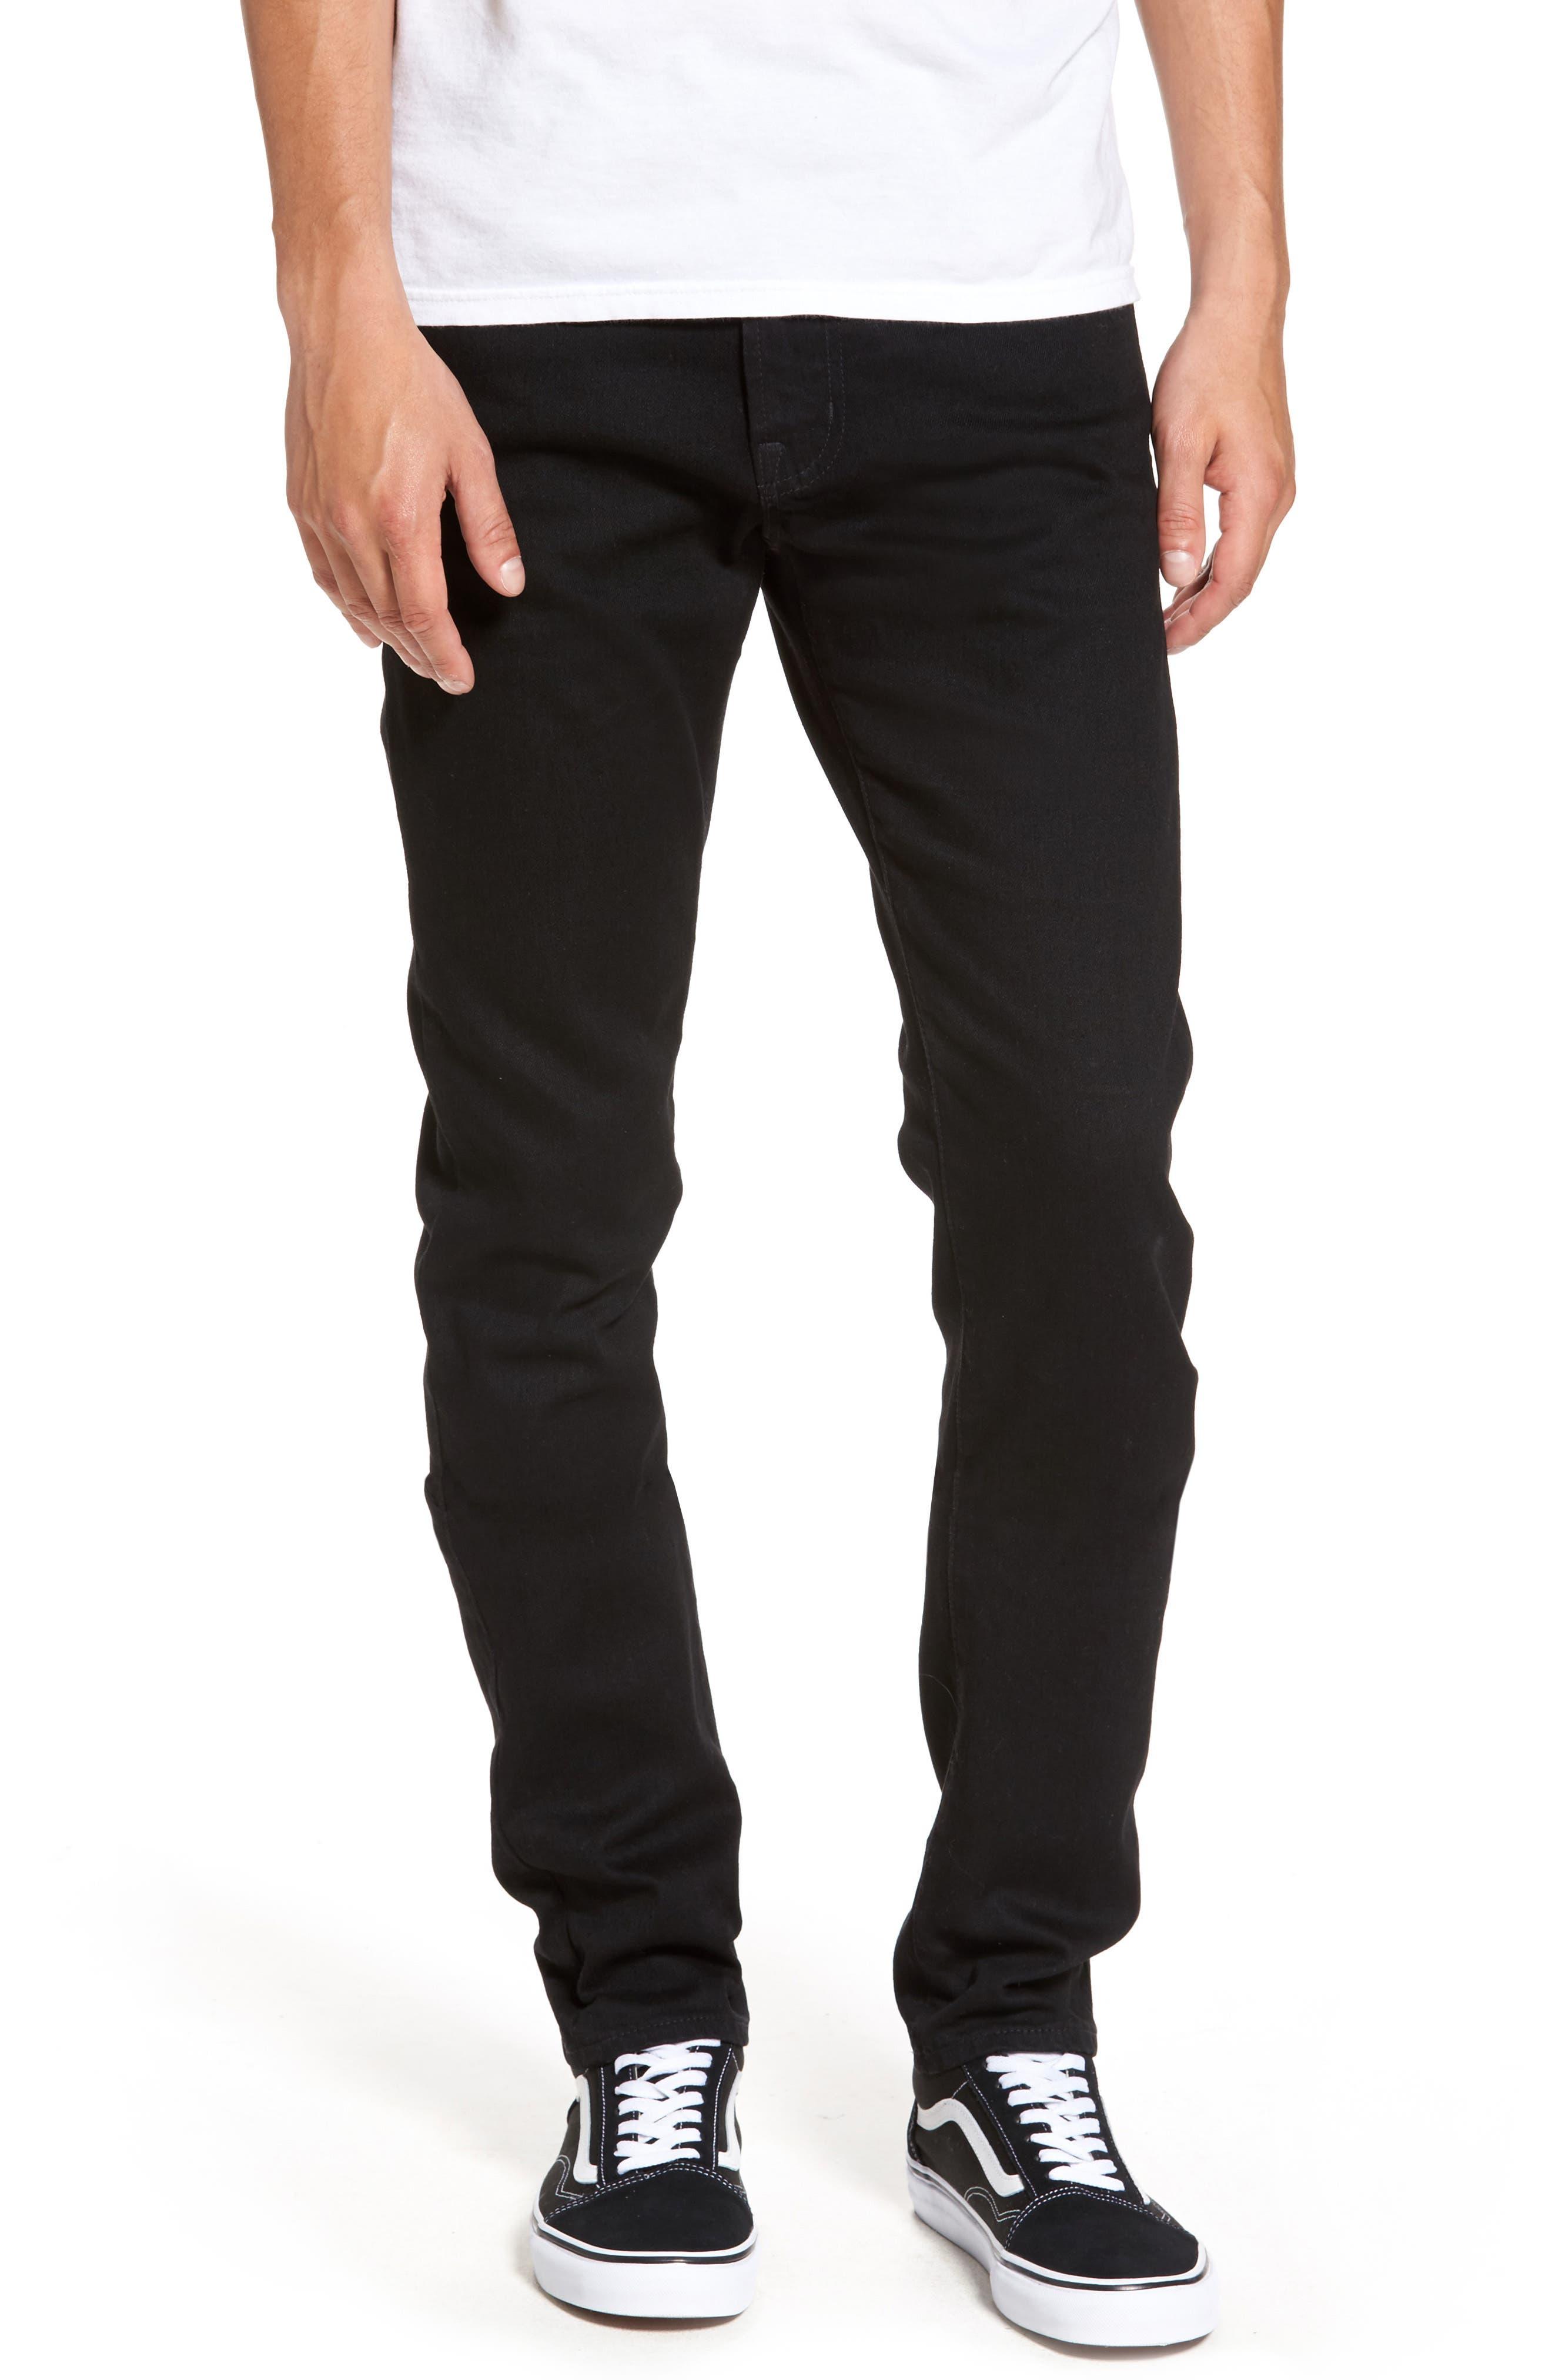 Alternate Image 1 Selected - AG Dylan Slim Skinny Fit Jeans (Deep Pitch)